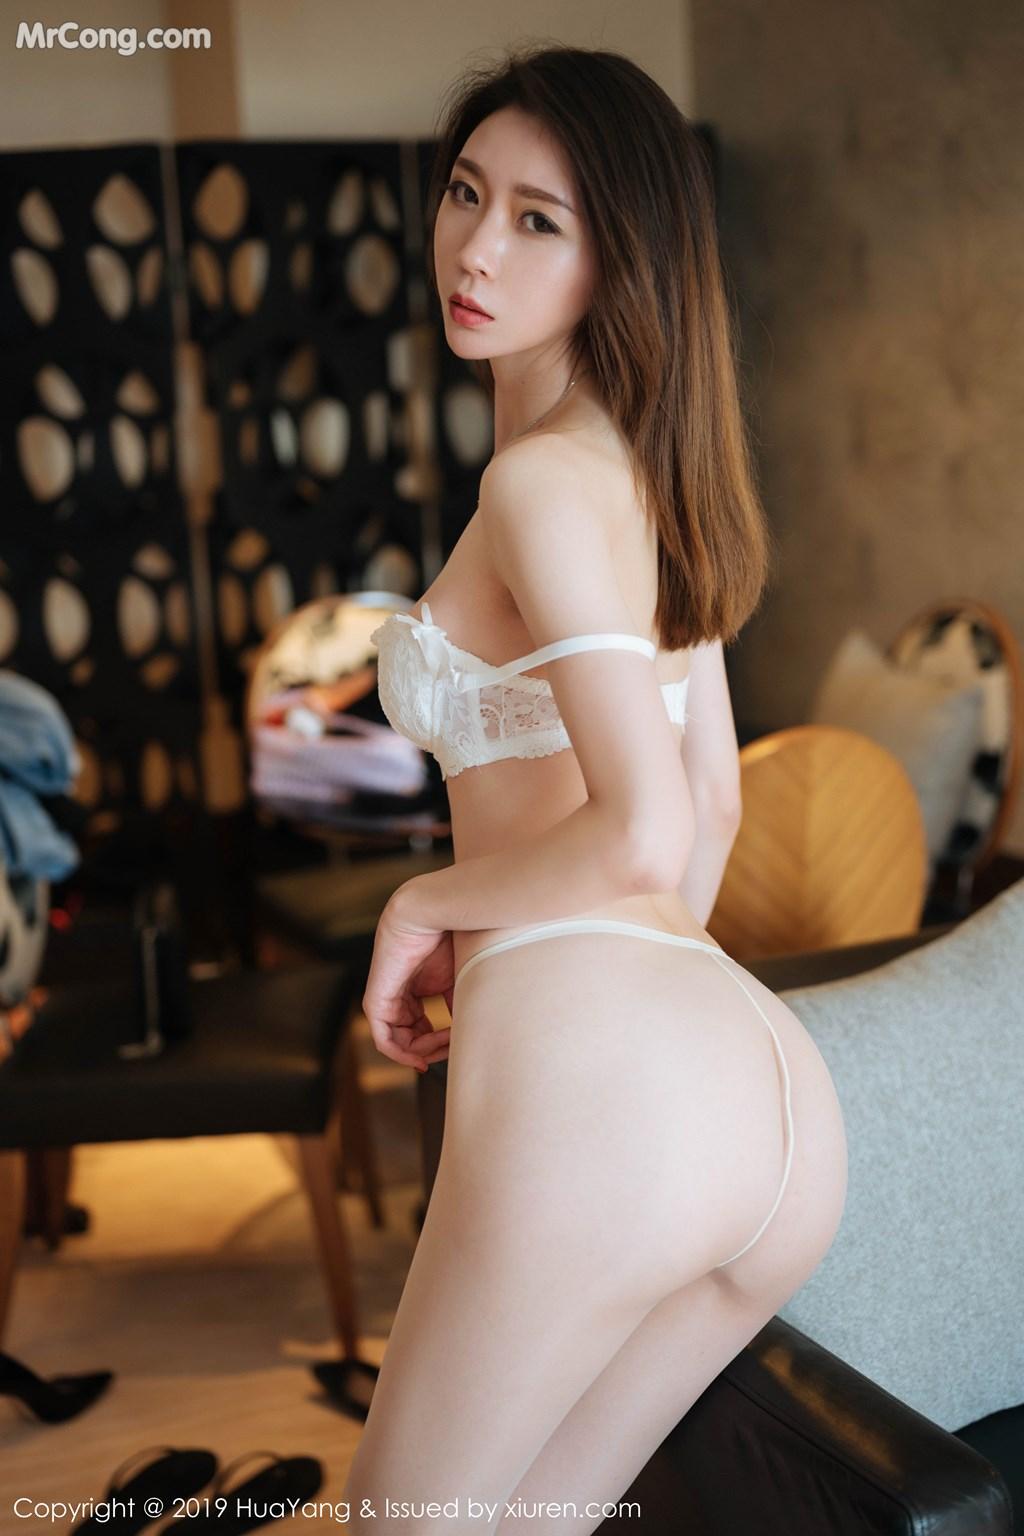 Image HuaYang-Vol.170-Meng-Xin-Yue-MrCong.com-032 in post HuaYang Vol.170: Meng Xin Yue (梦心月) (61 ảnh)